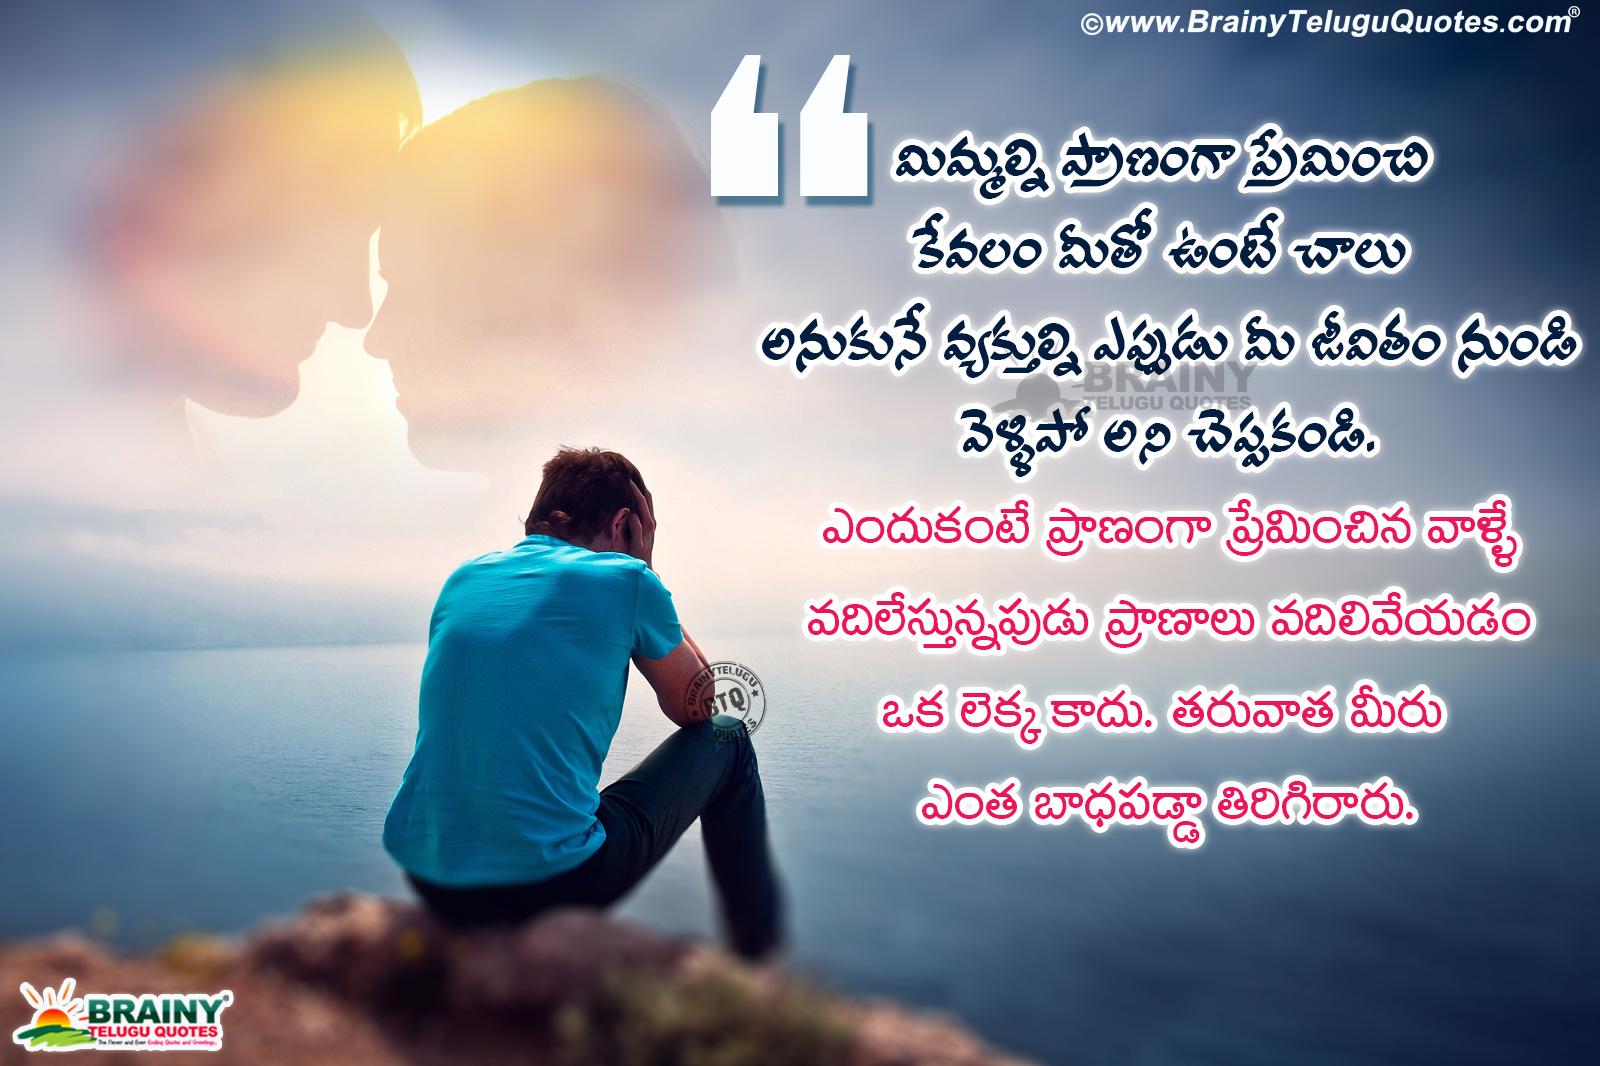 Heart Breaking Love Quotes In Telugu Prema Telugu Love